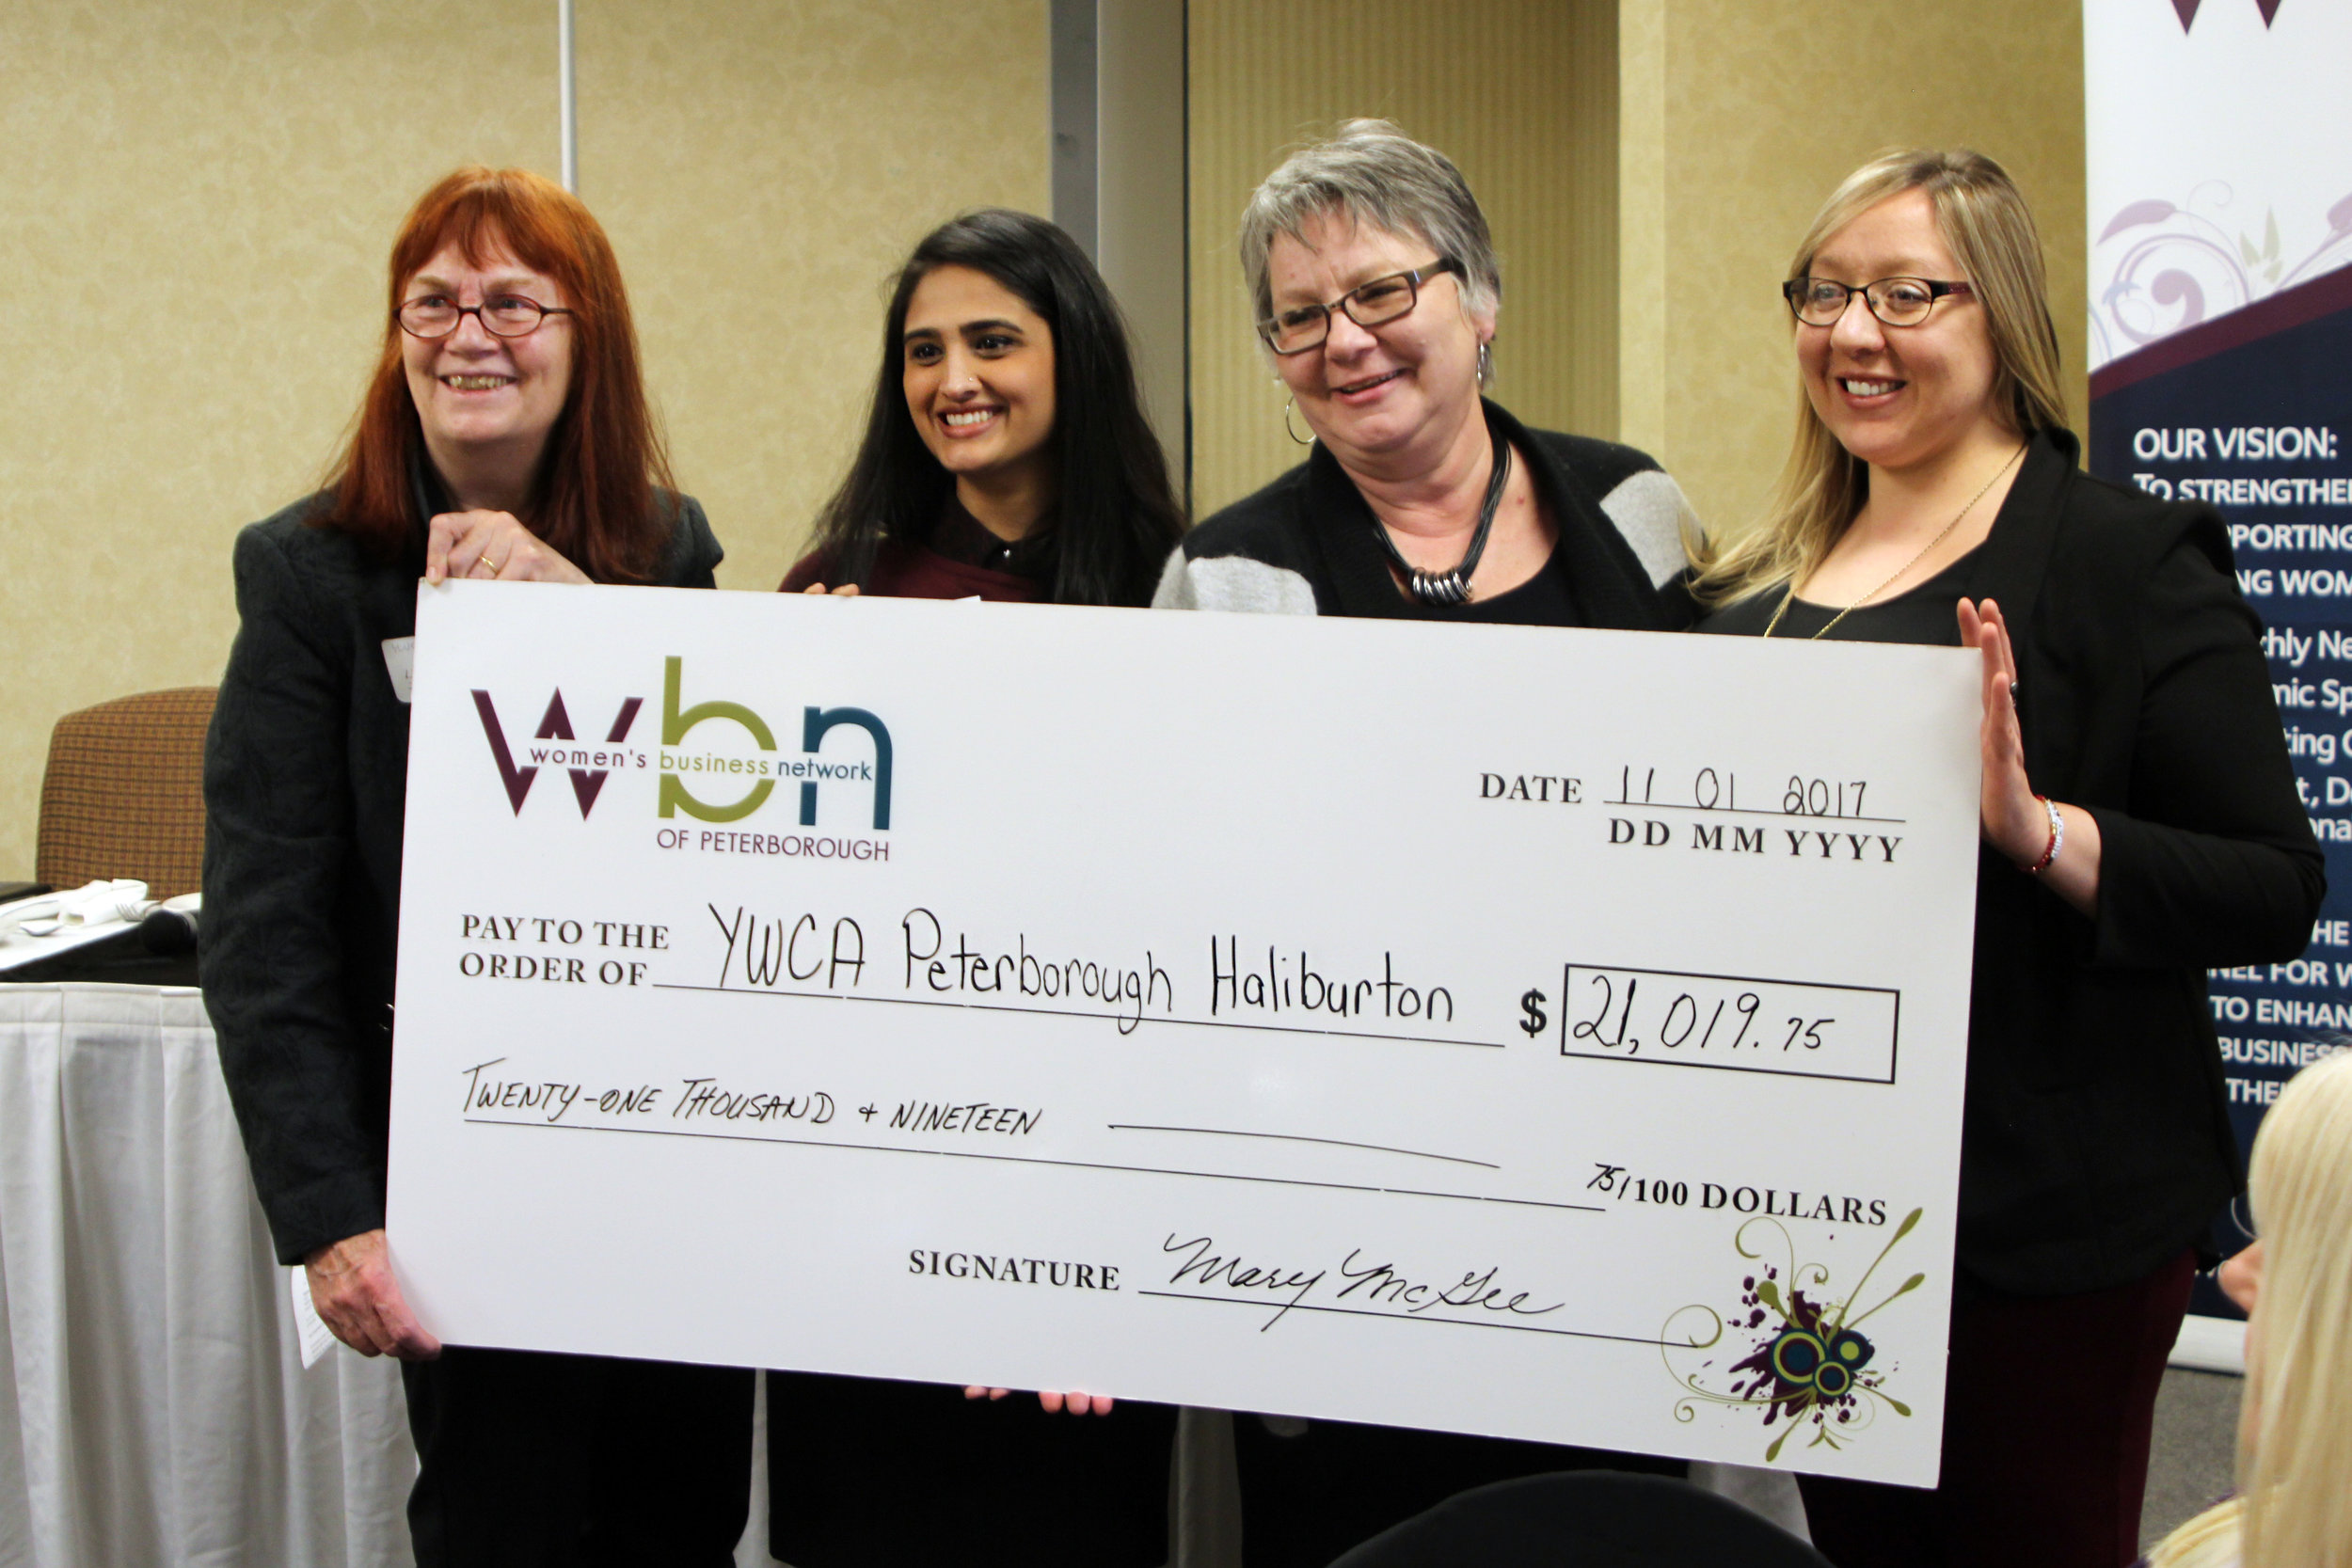 Left to right:  Lynn Zimmer, Executive Director of YWCA Peterborough Haliburton; WBN Program Directors, Sana Virji and Louise Racine; and Nicole Pare, YWCA Special Events Coordinator.